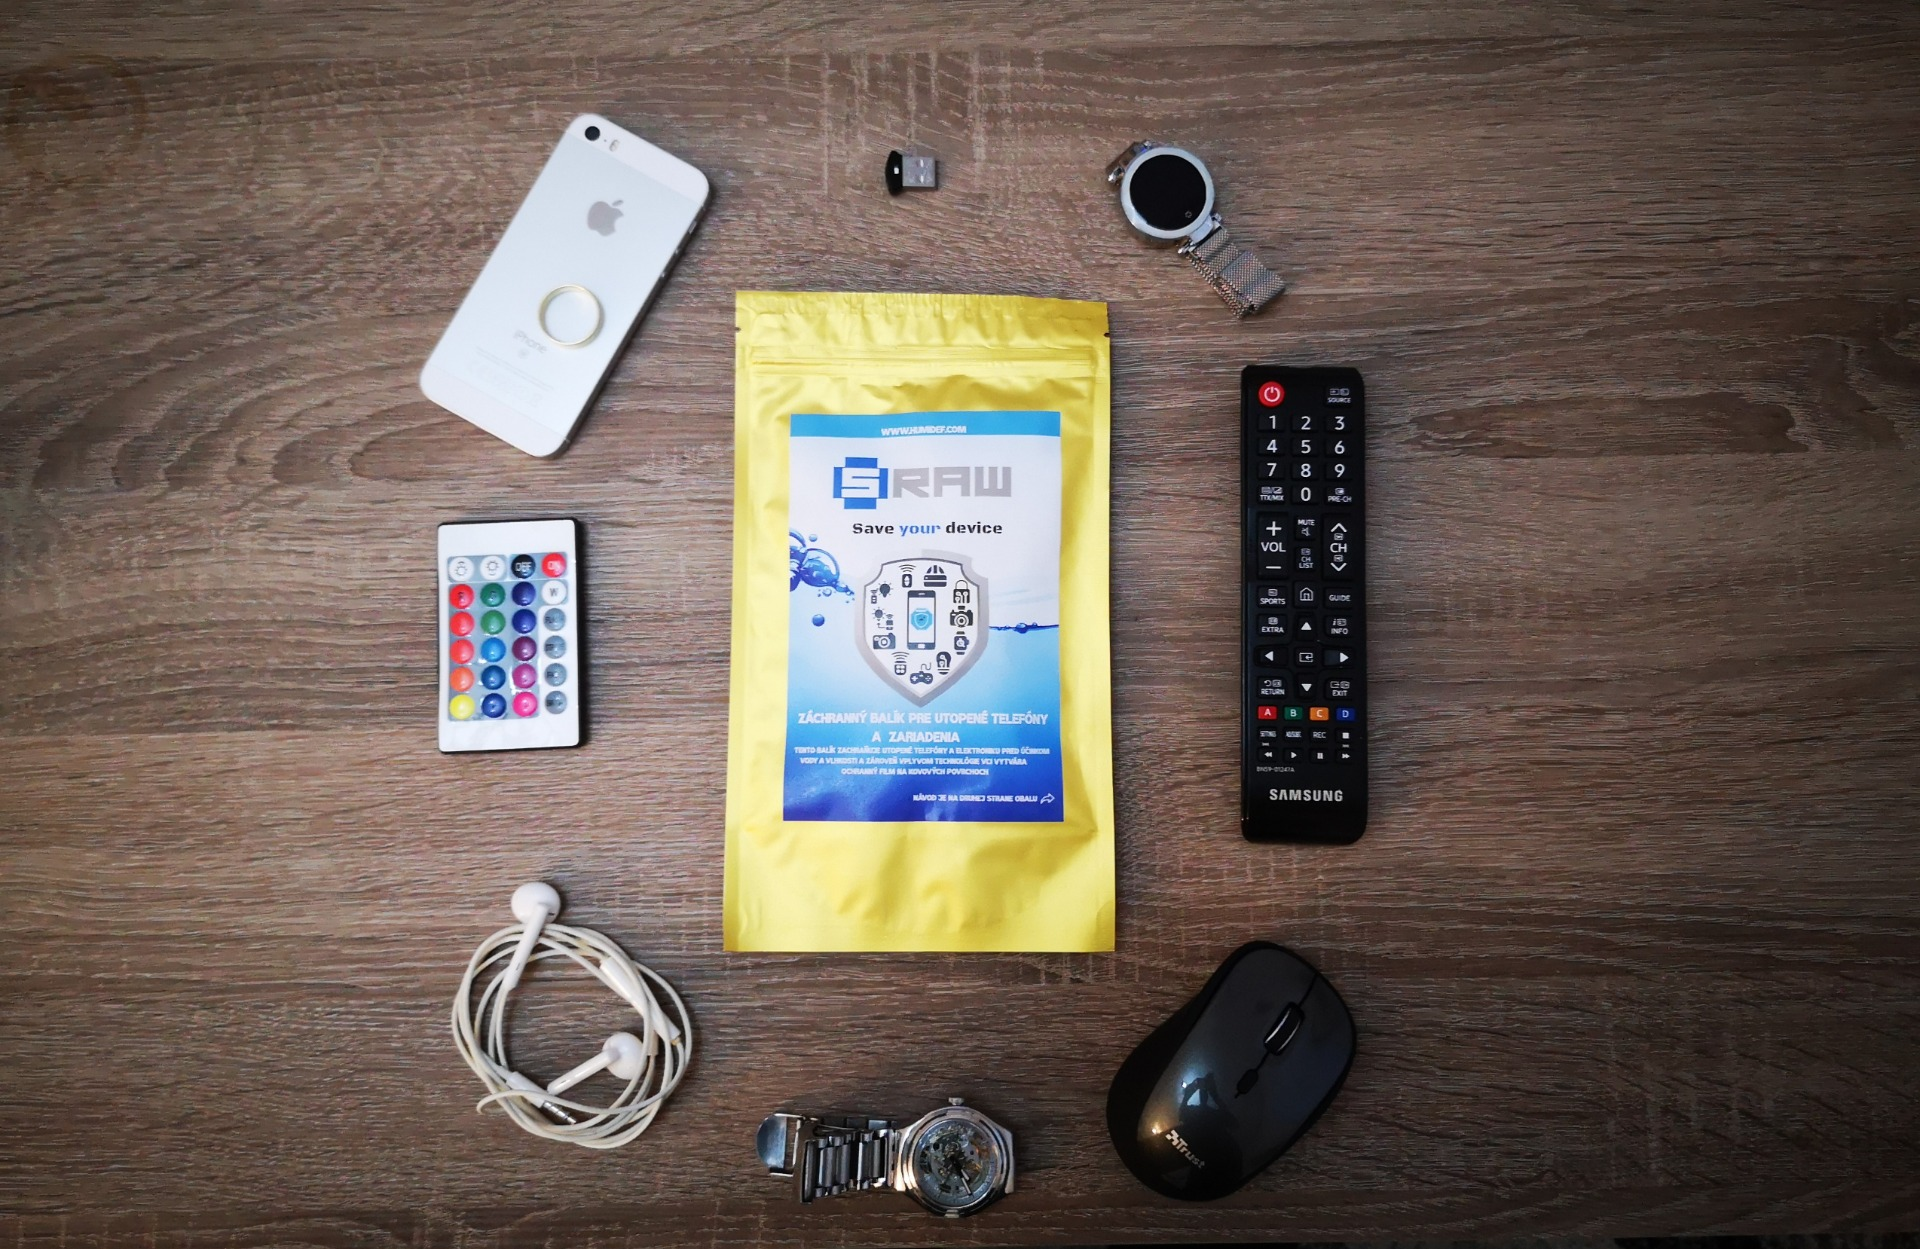 Slovenská nanotechnológia Humidef ochráni tvoju elektroniku!